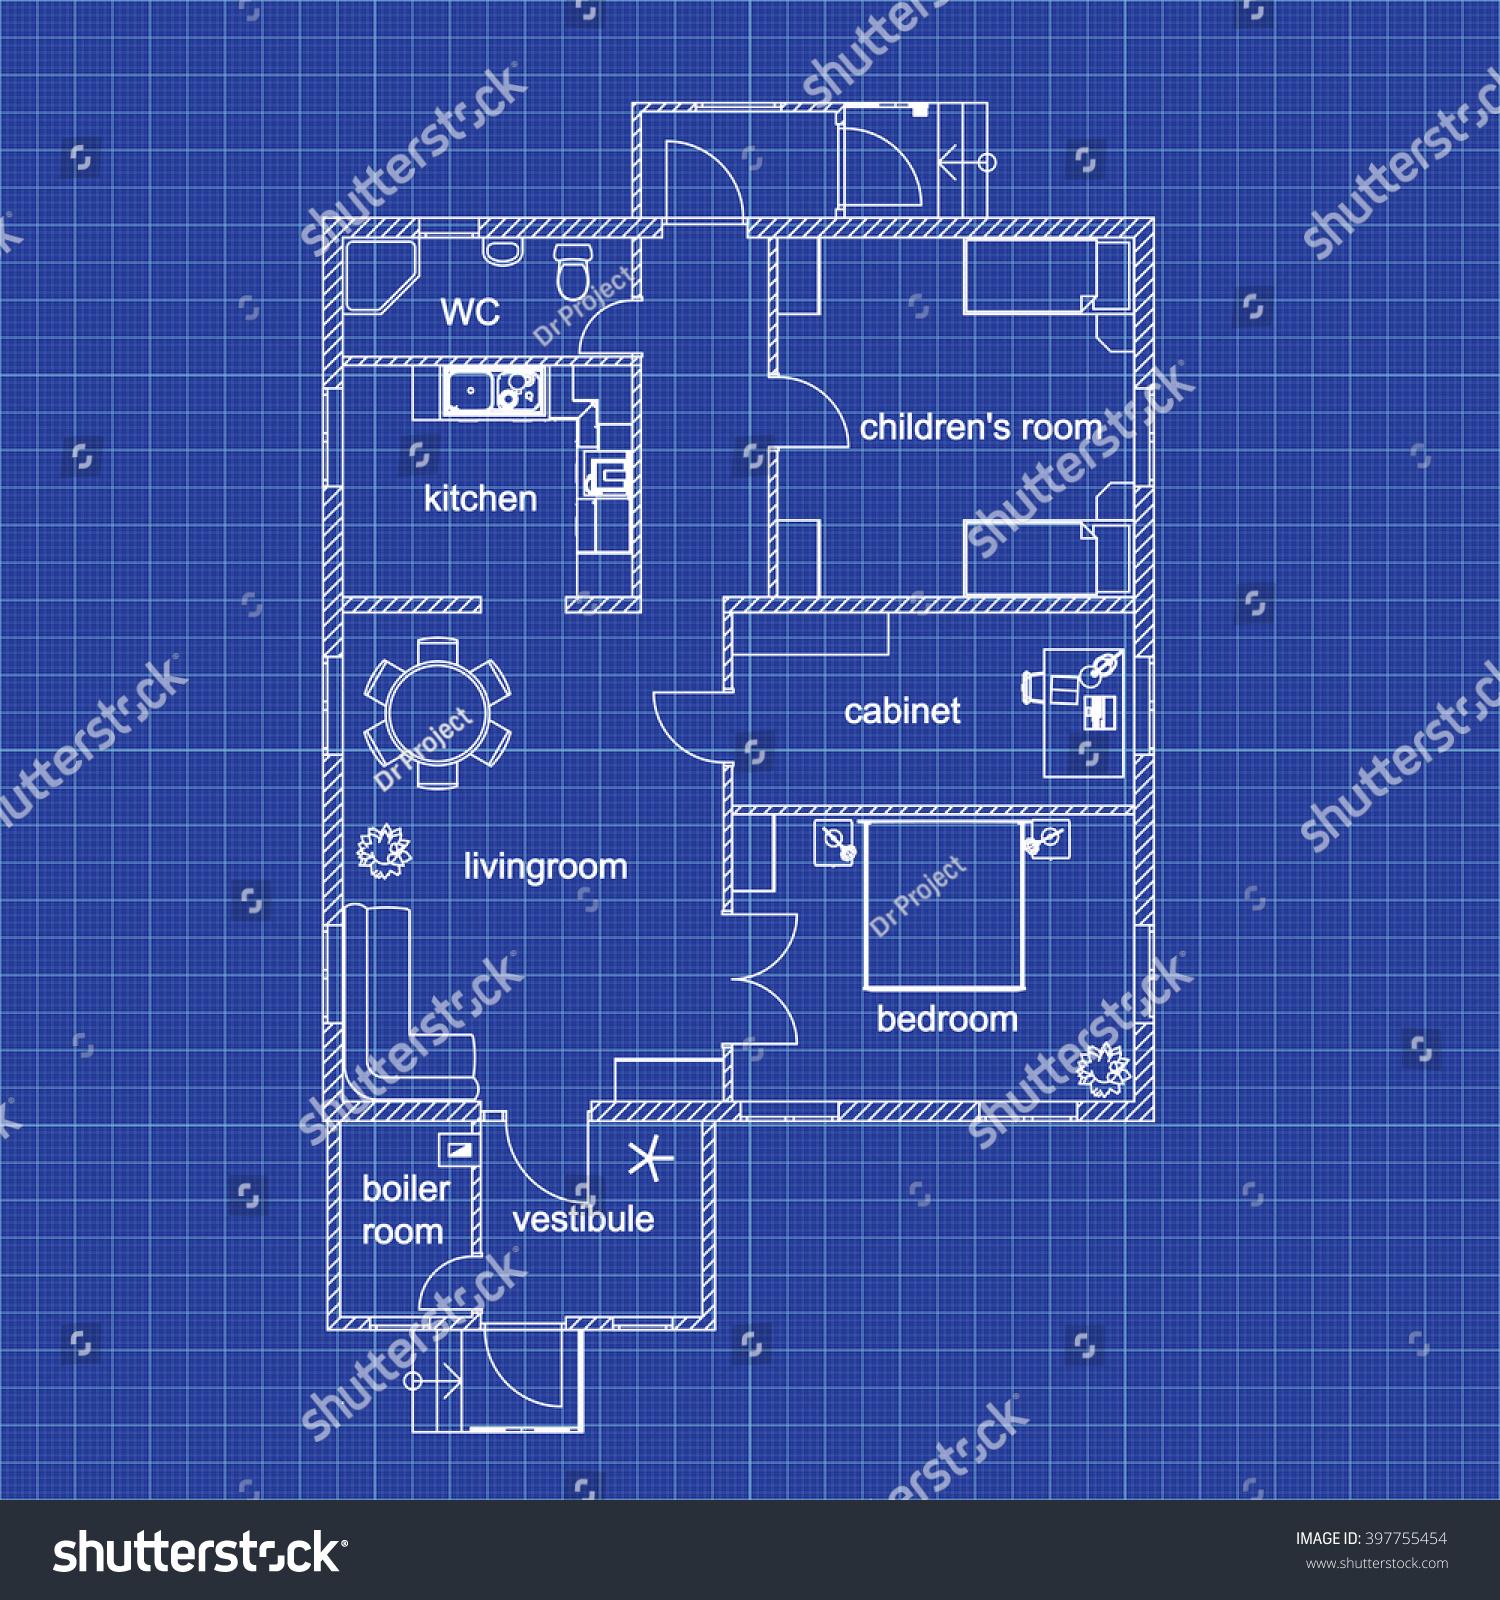 Blueprint floor plan modern apartment on stock vector for Blueprint architects